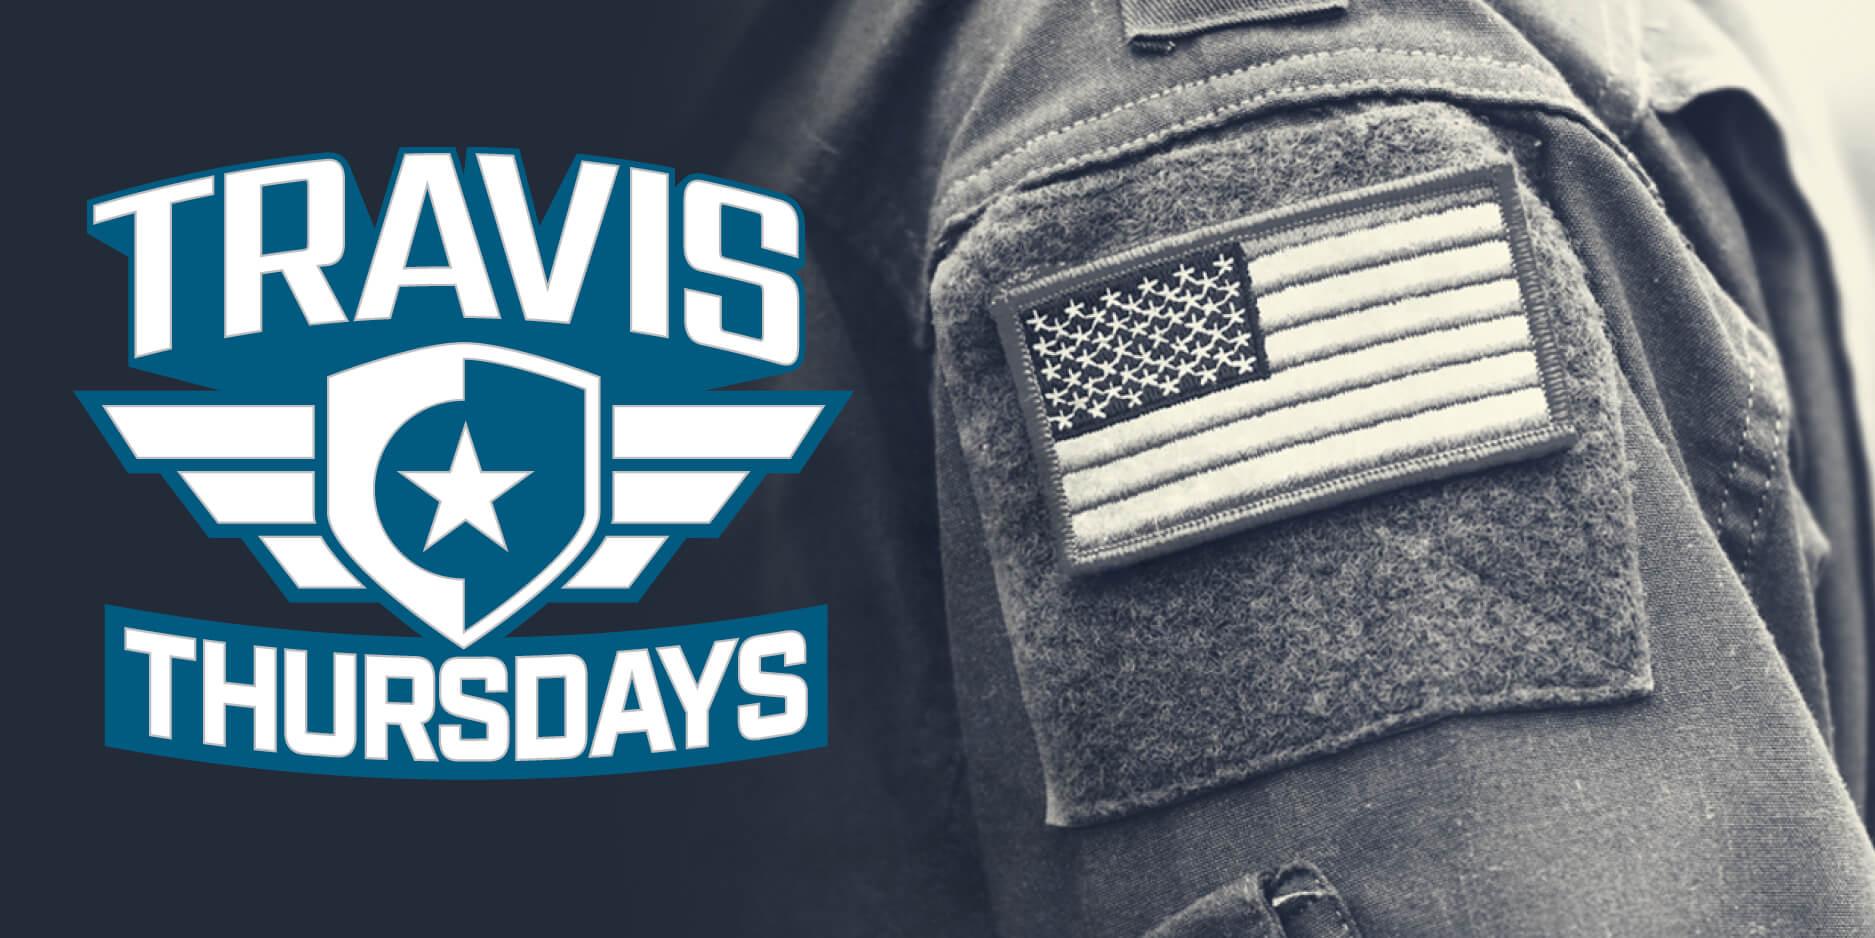 Travis Thursdays